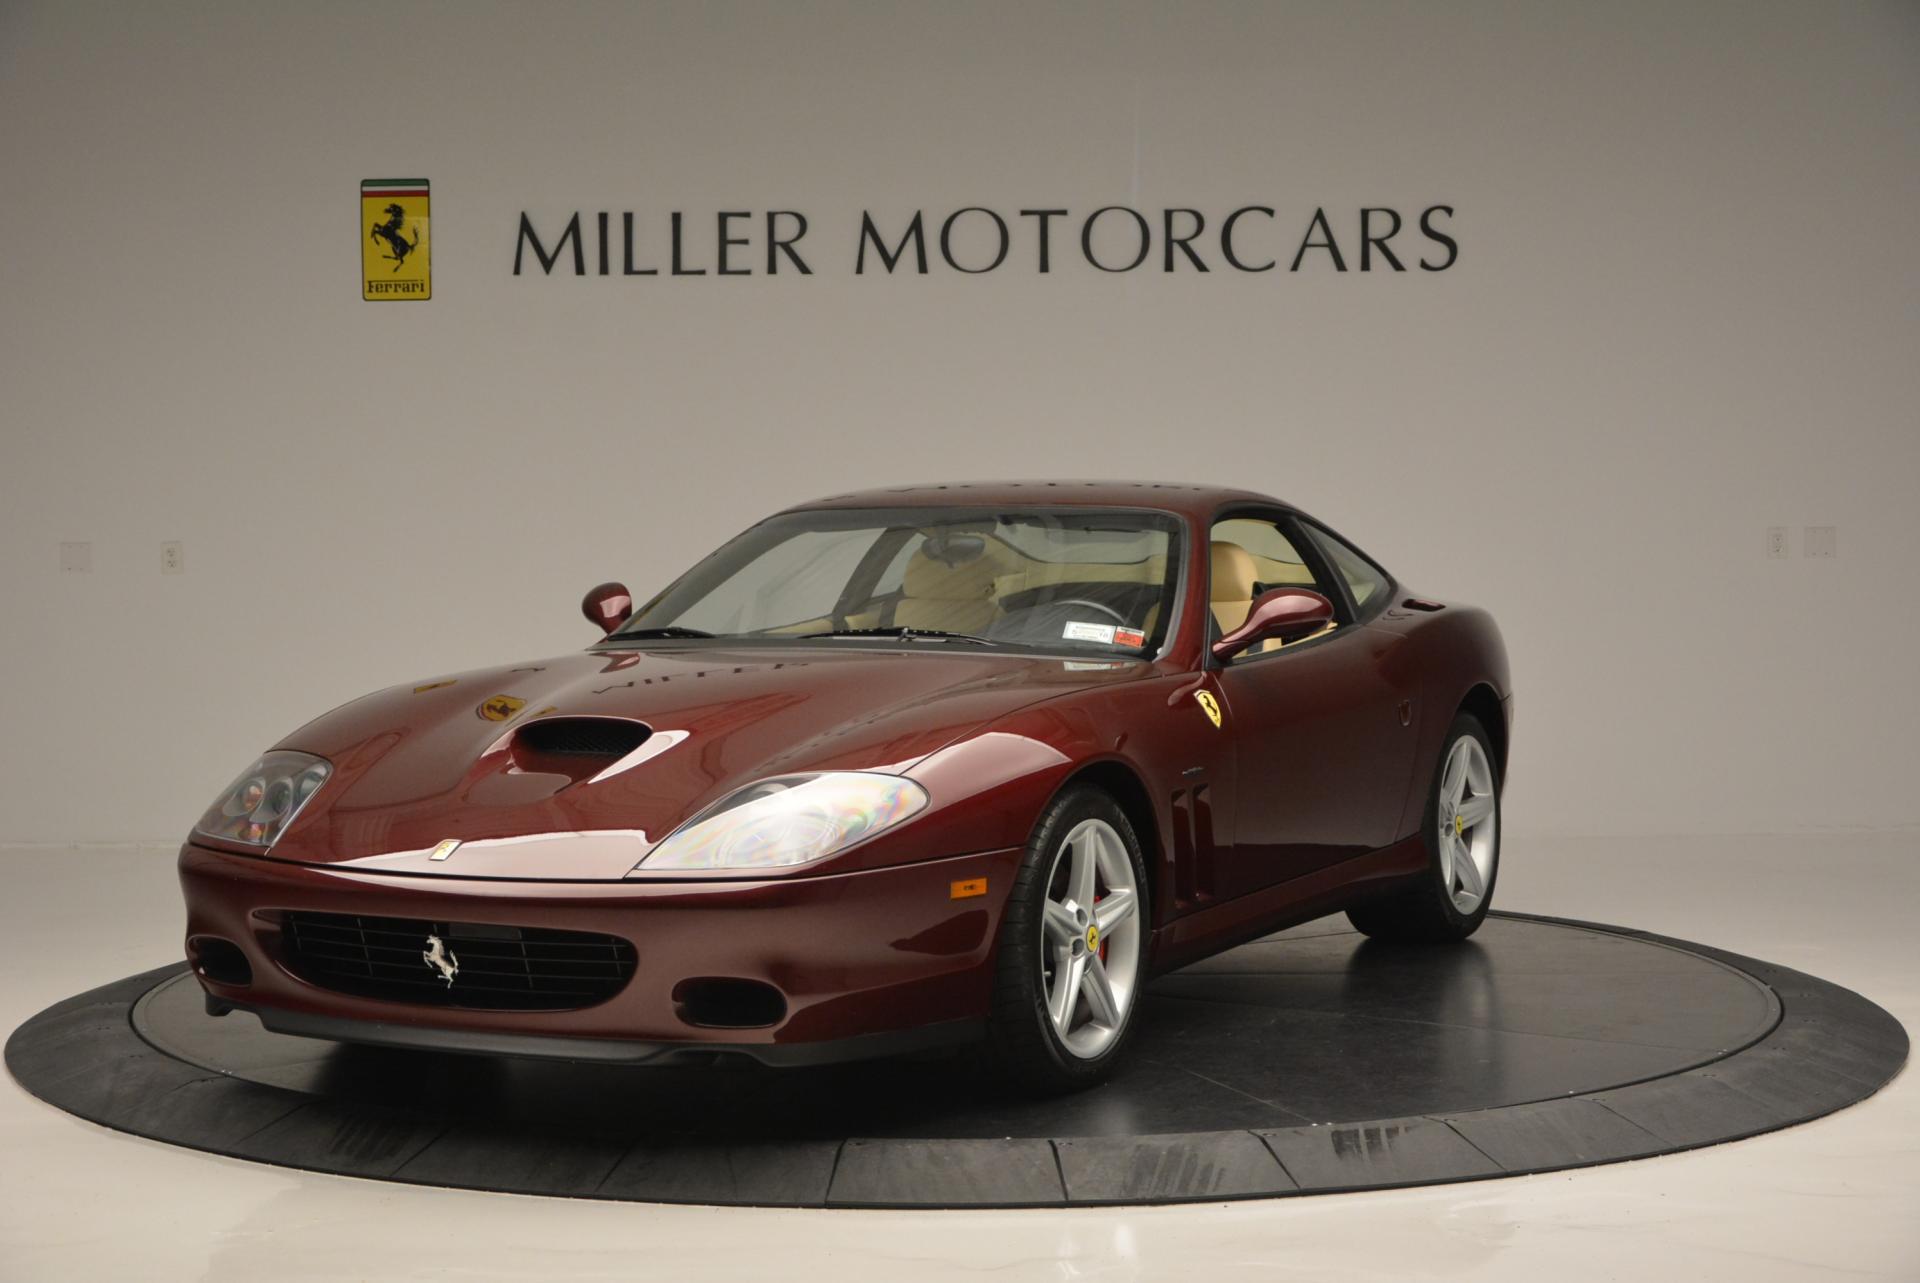 Used 2003 Ferrari 575M Maranello 6-Speed Manual for sale Sold at Aston Martin of Greenwich in Greenwich CT 06830 1